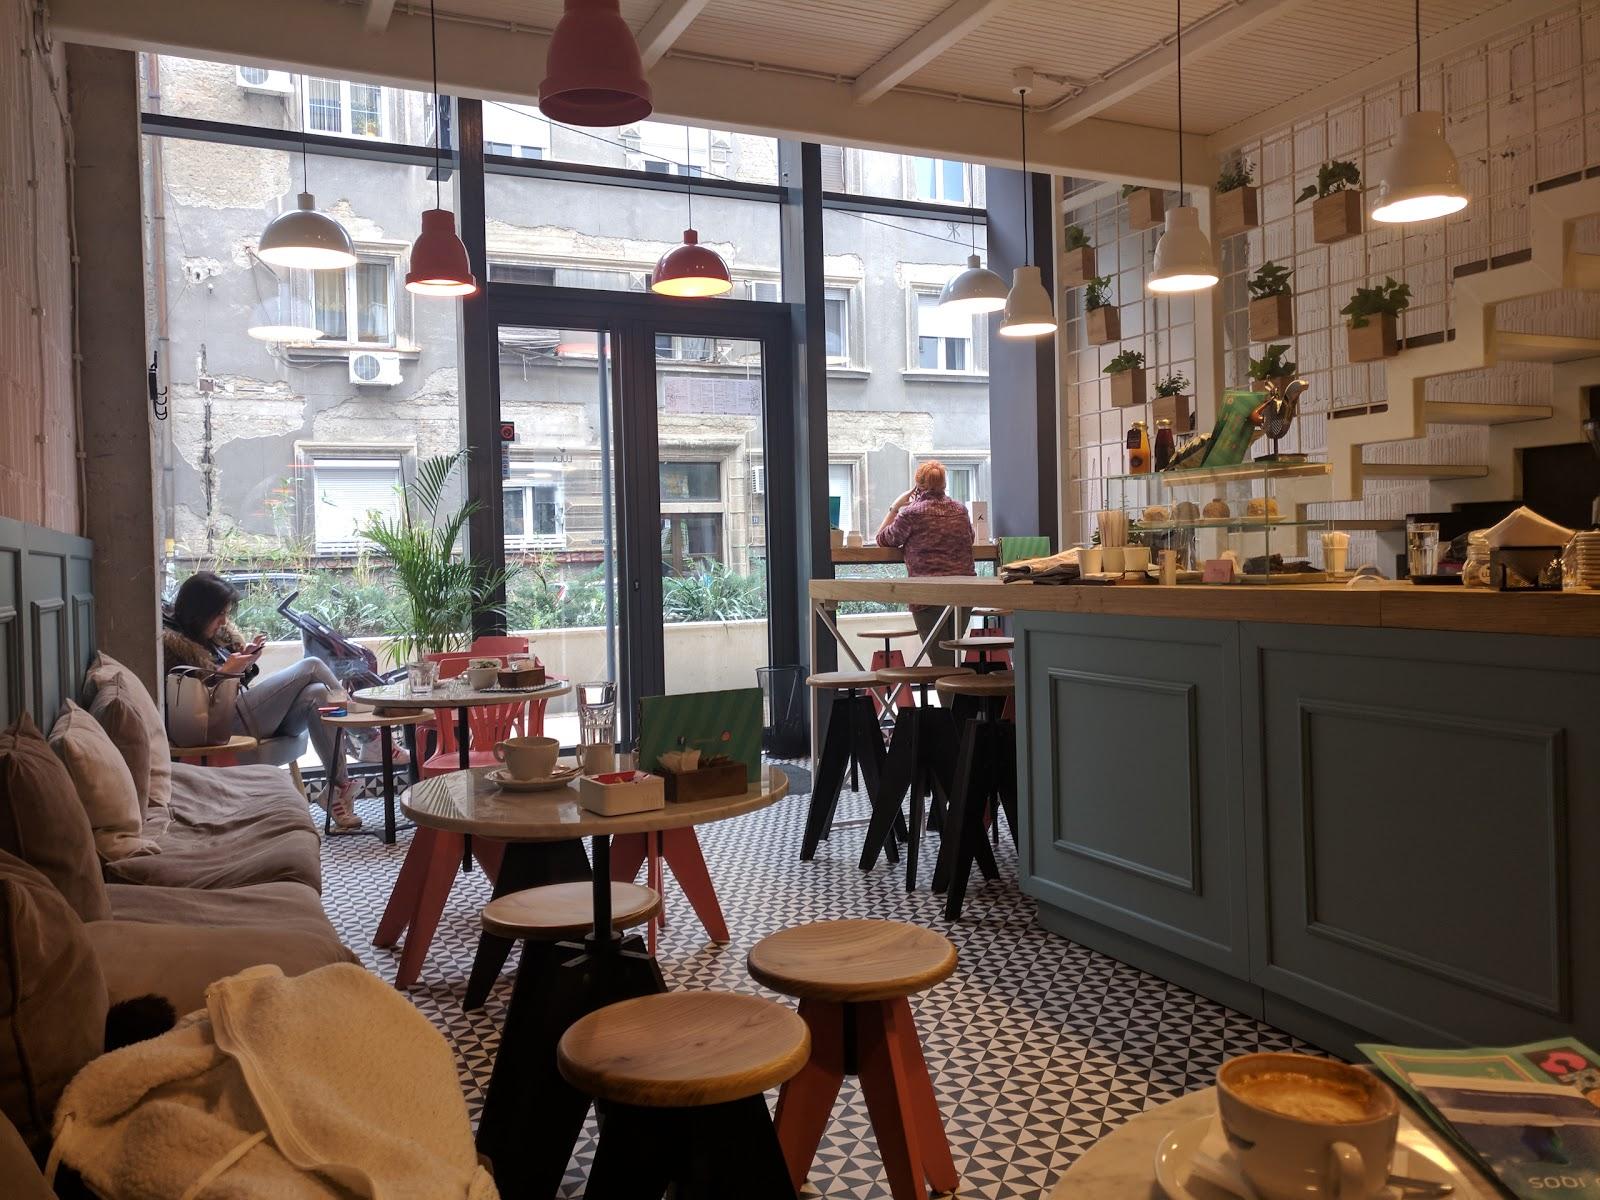 Lula fine espresso bar: A Work-Friendly Place in Belgrade